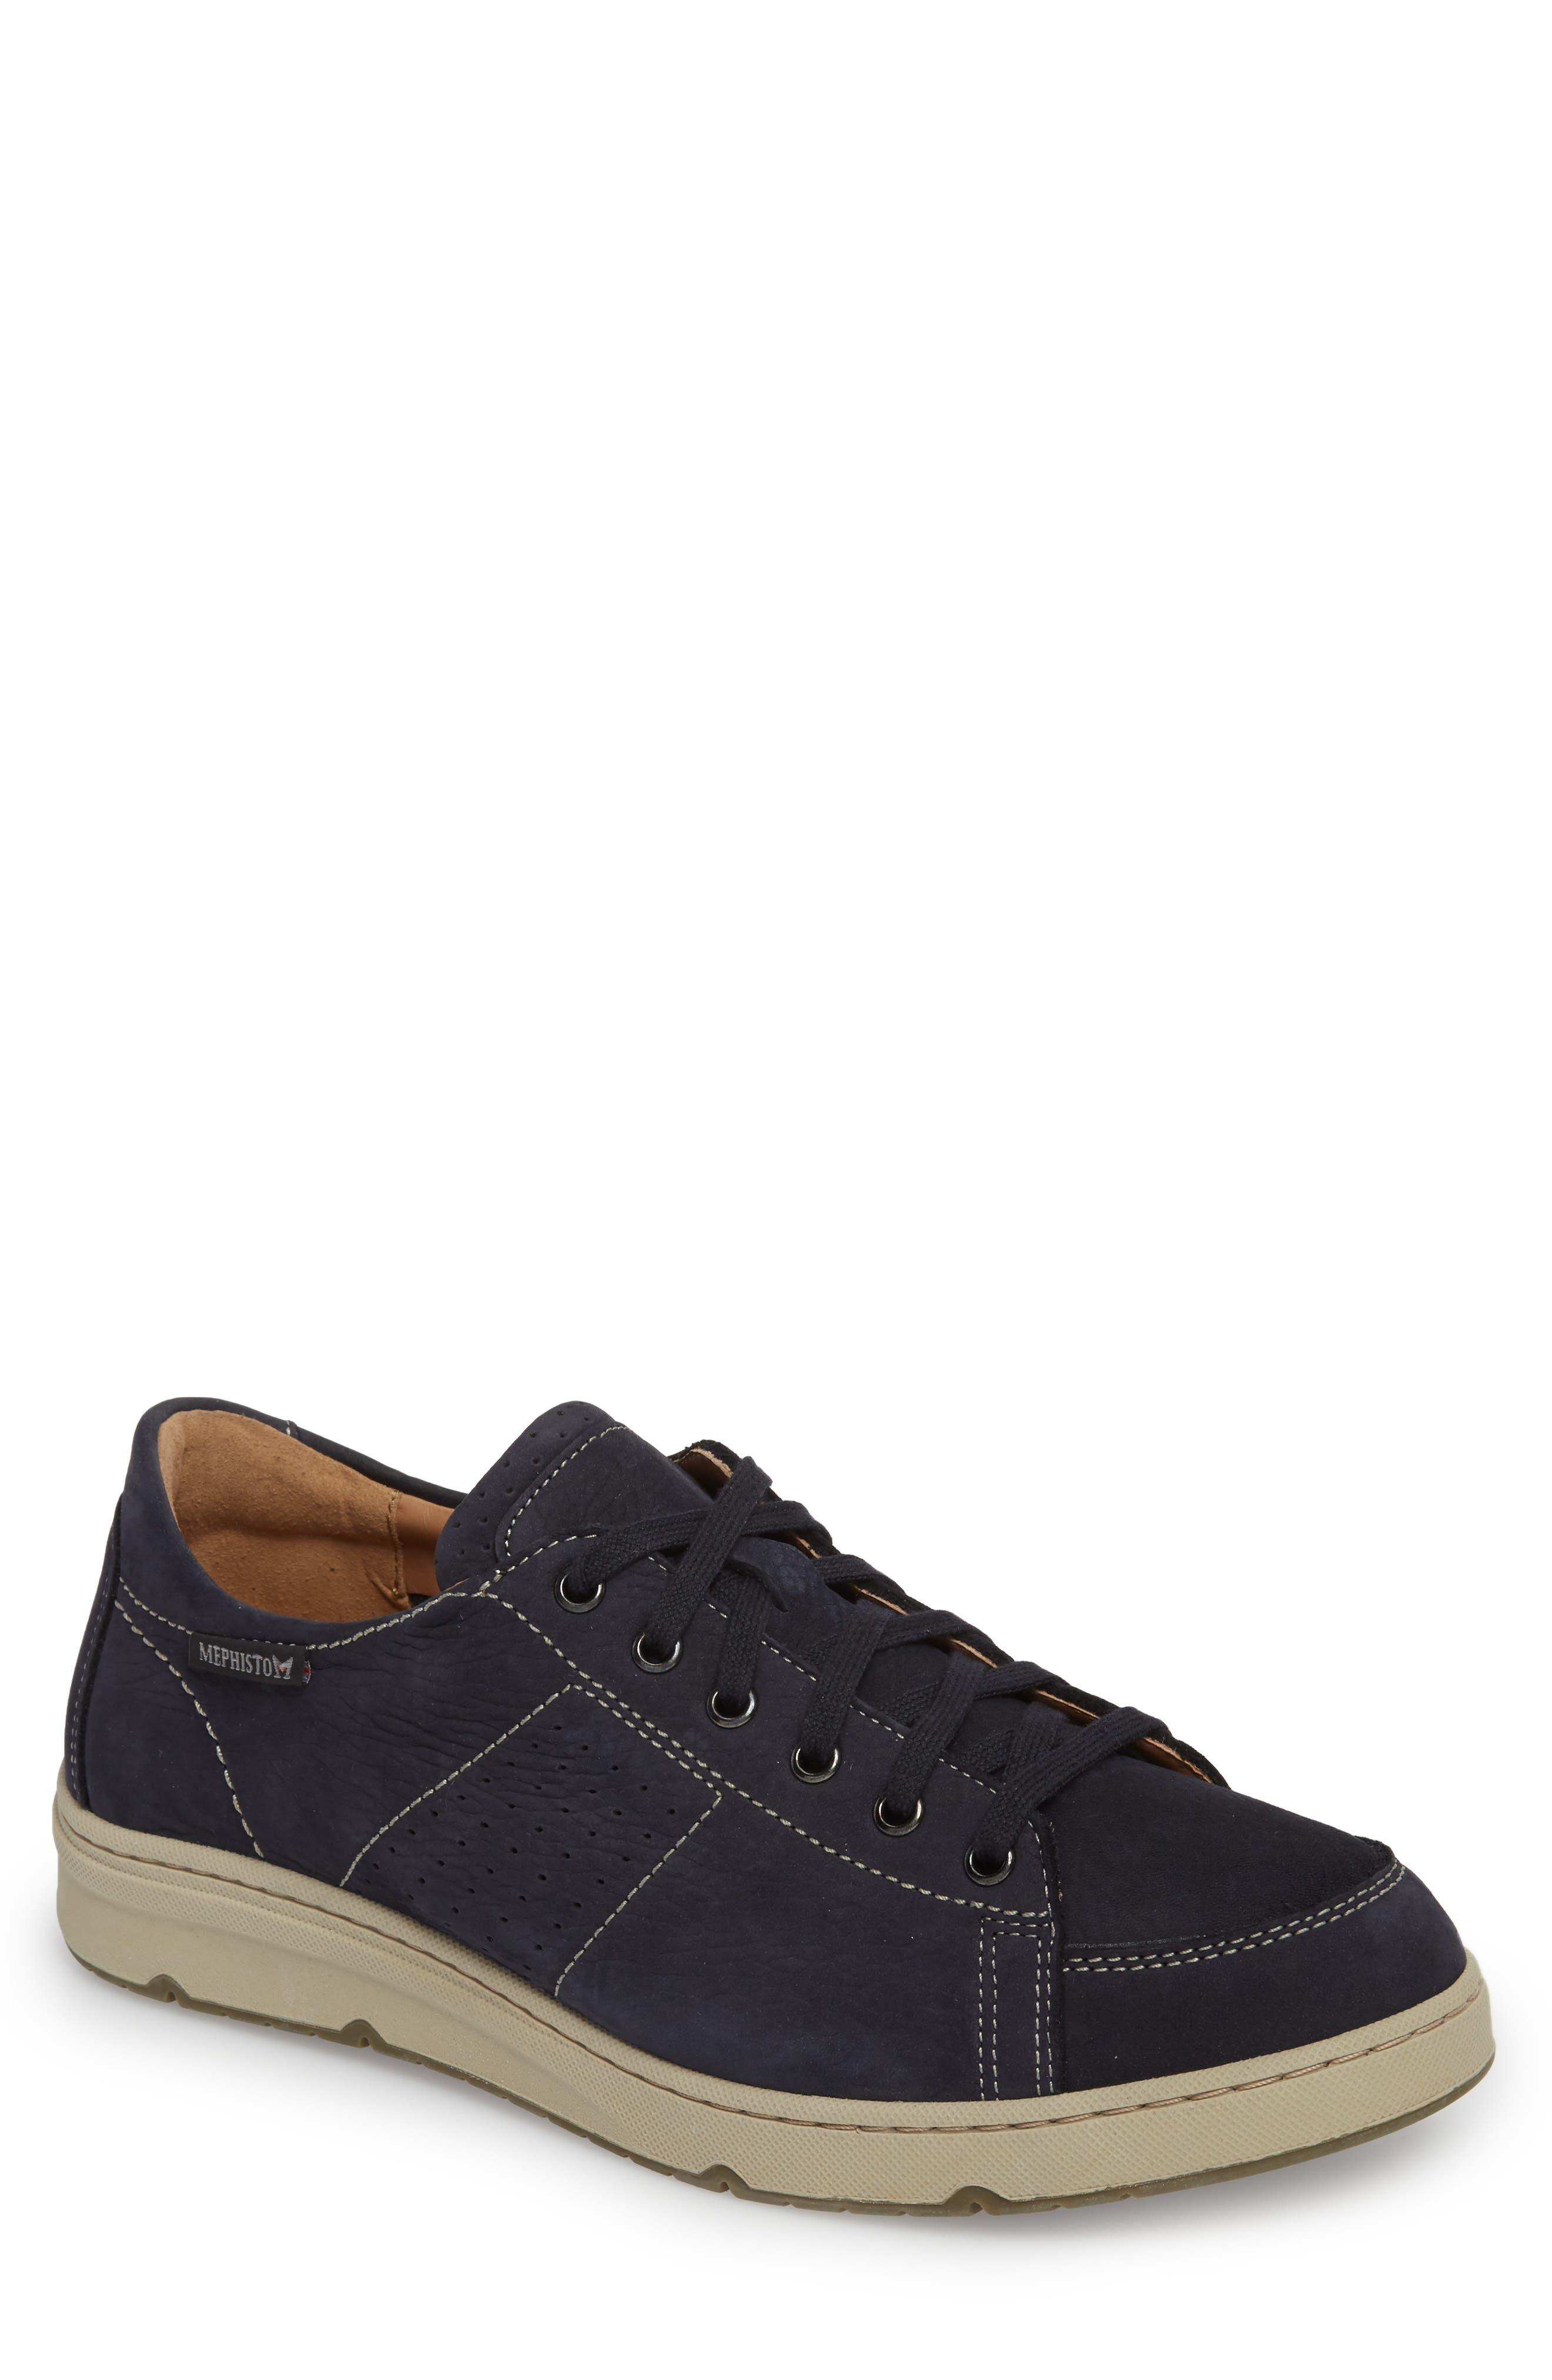 MEPHISTO, Jerome Sneaker, Main thumbnail 1, color, 411